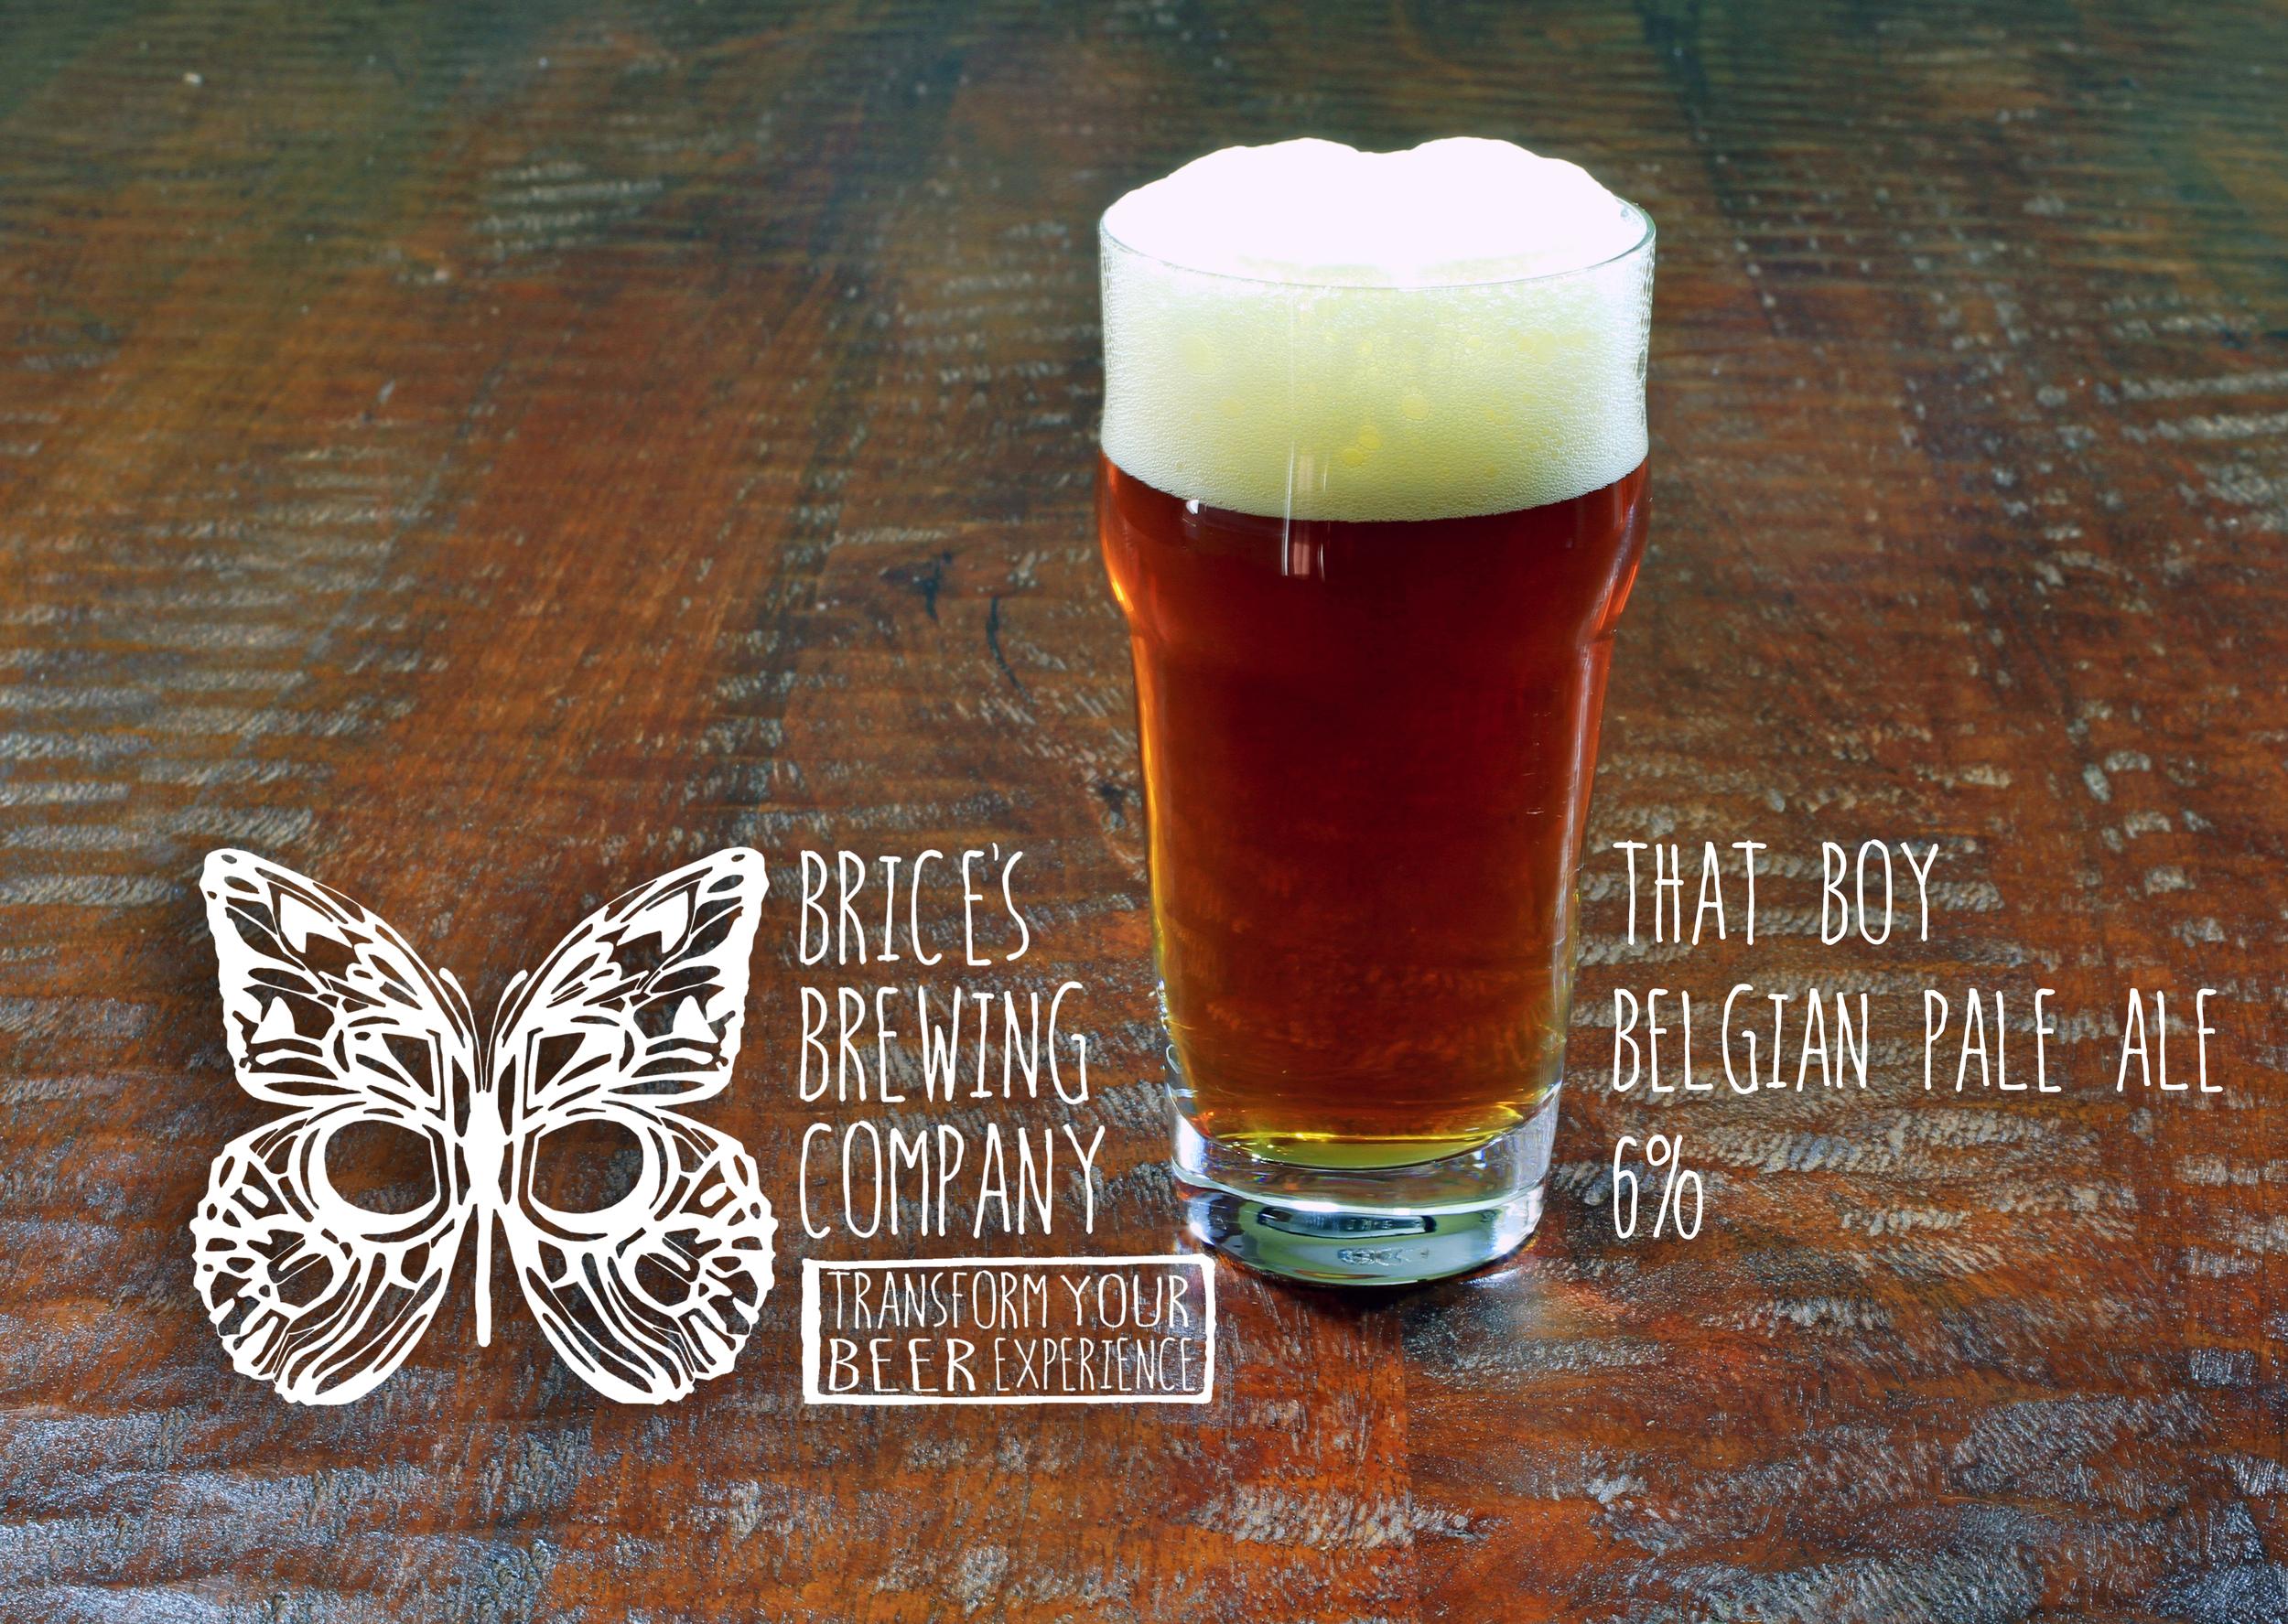 Belgian Pale Ale.jpg